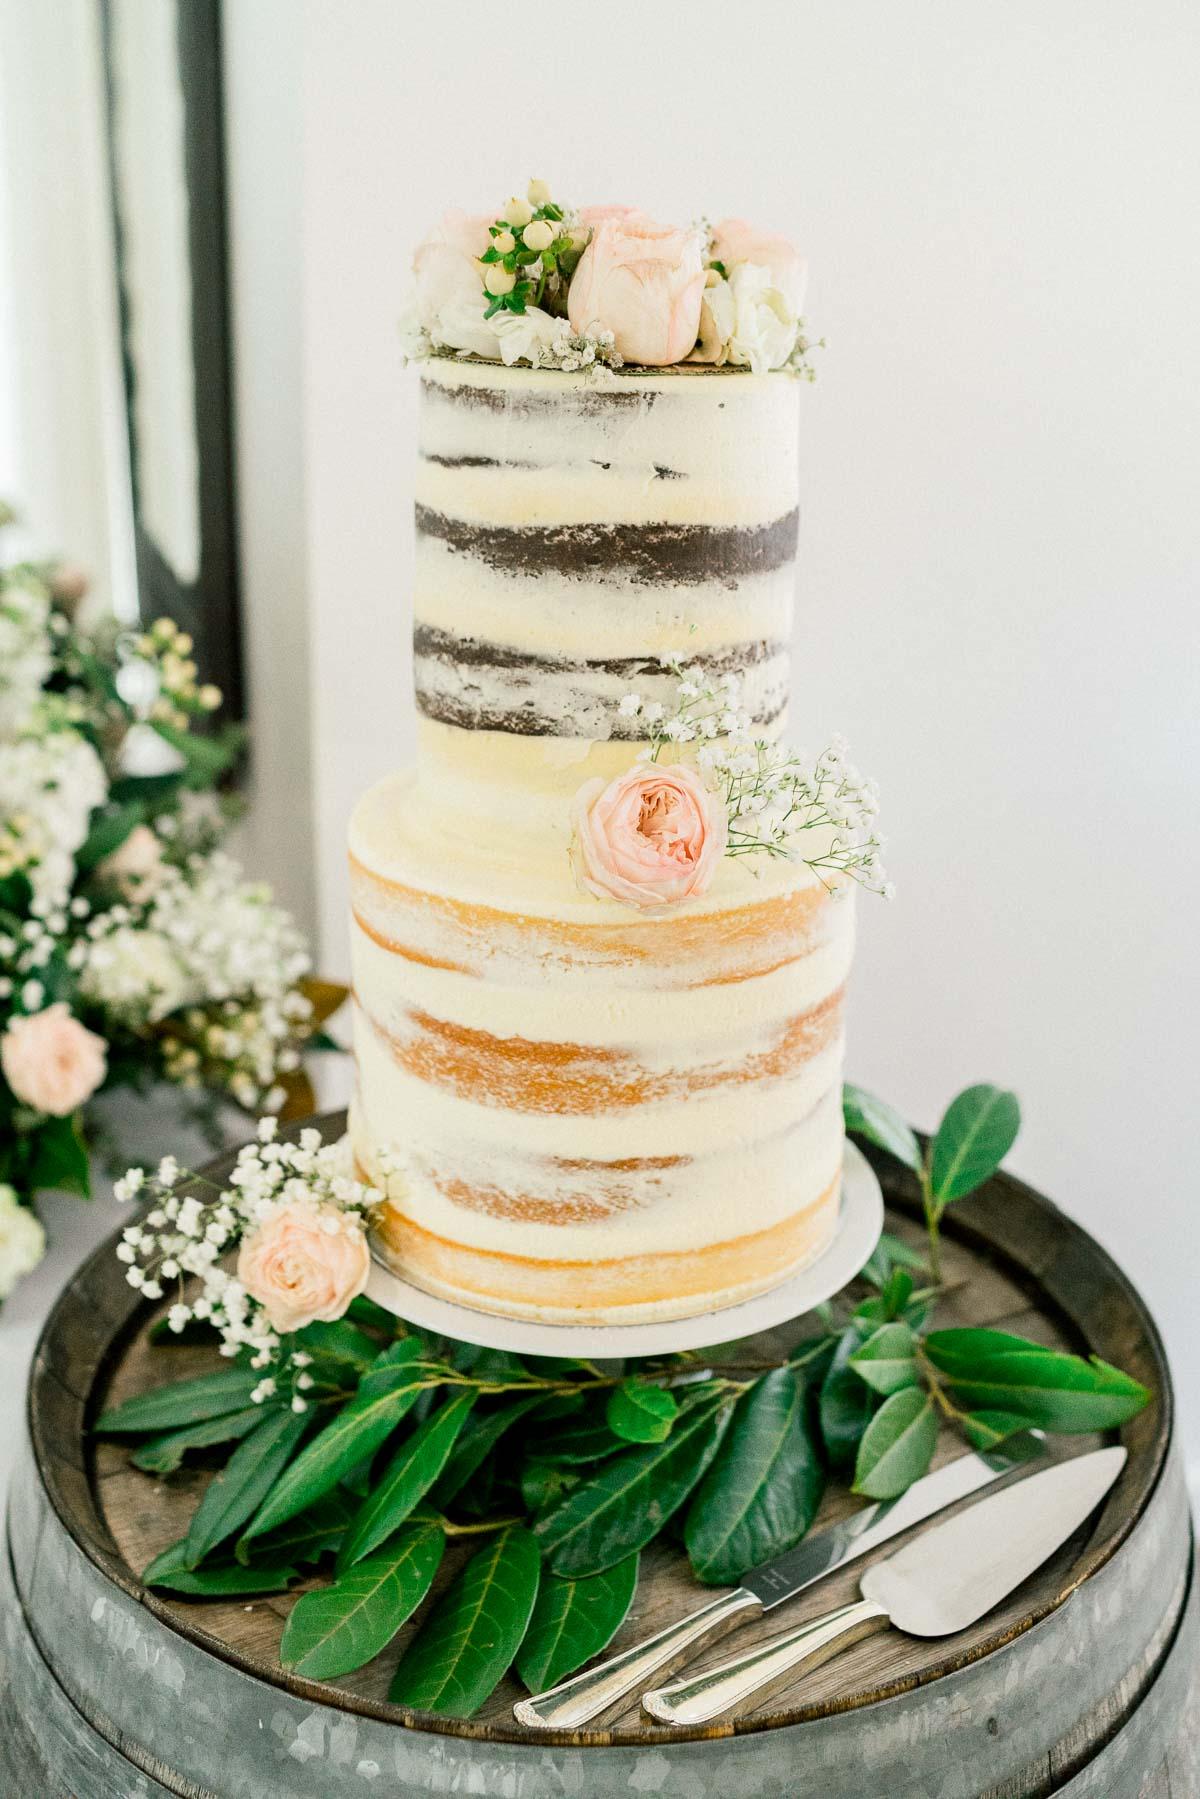 lindenderry-wedding-heart+soul-weddings-amy-alain-03836.jpg